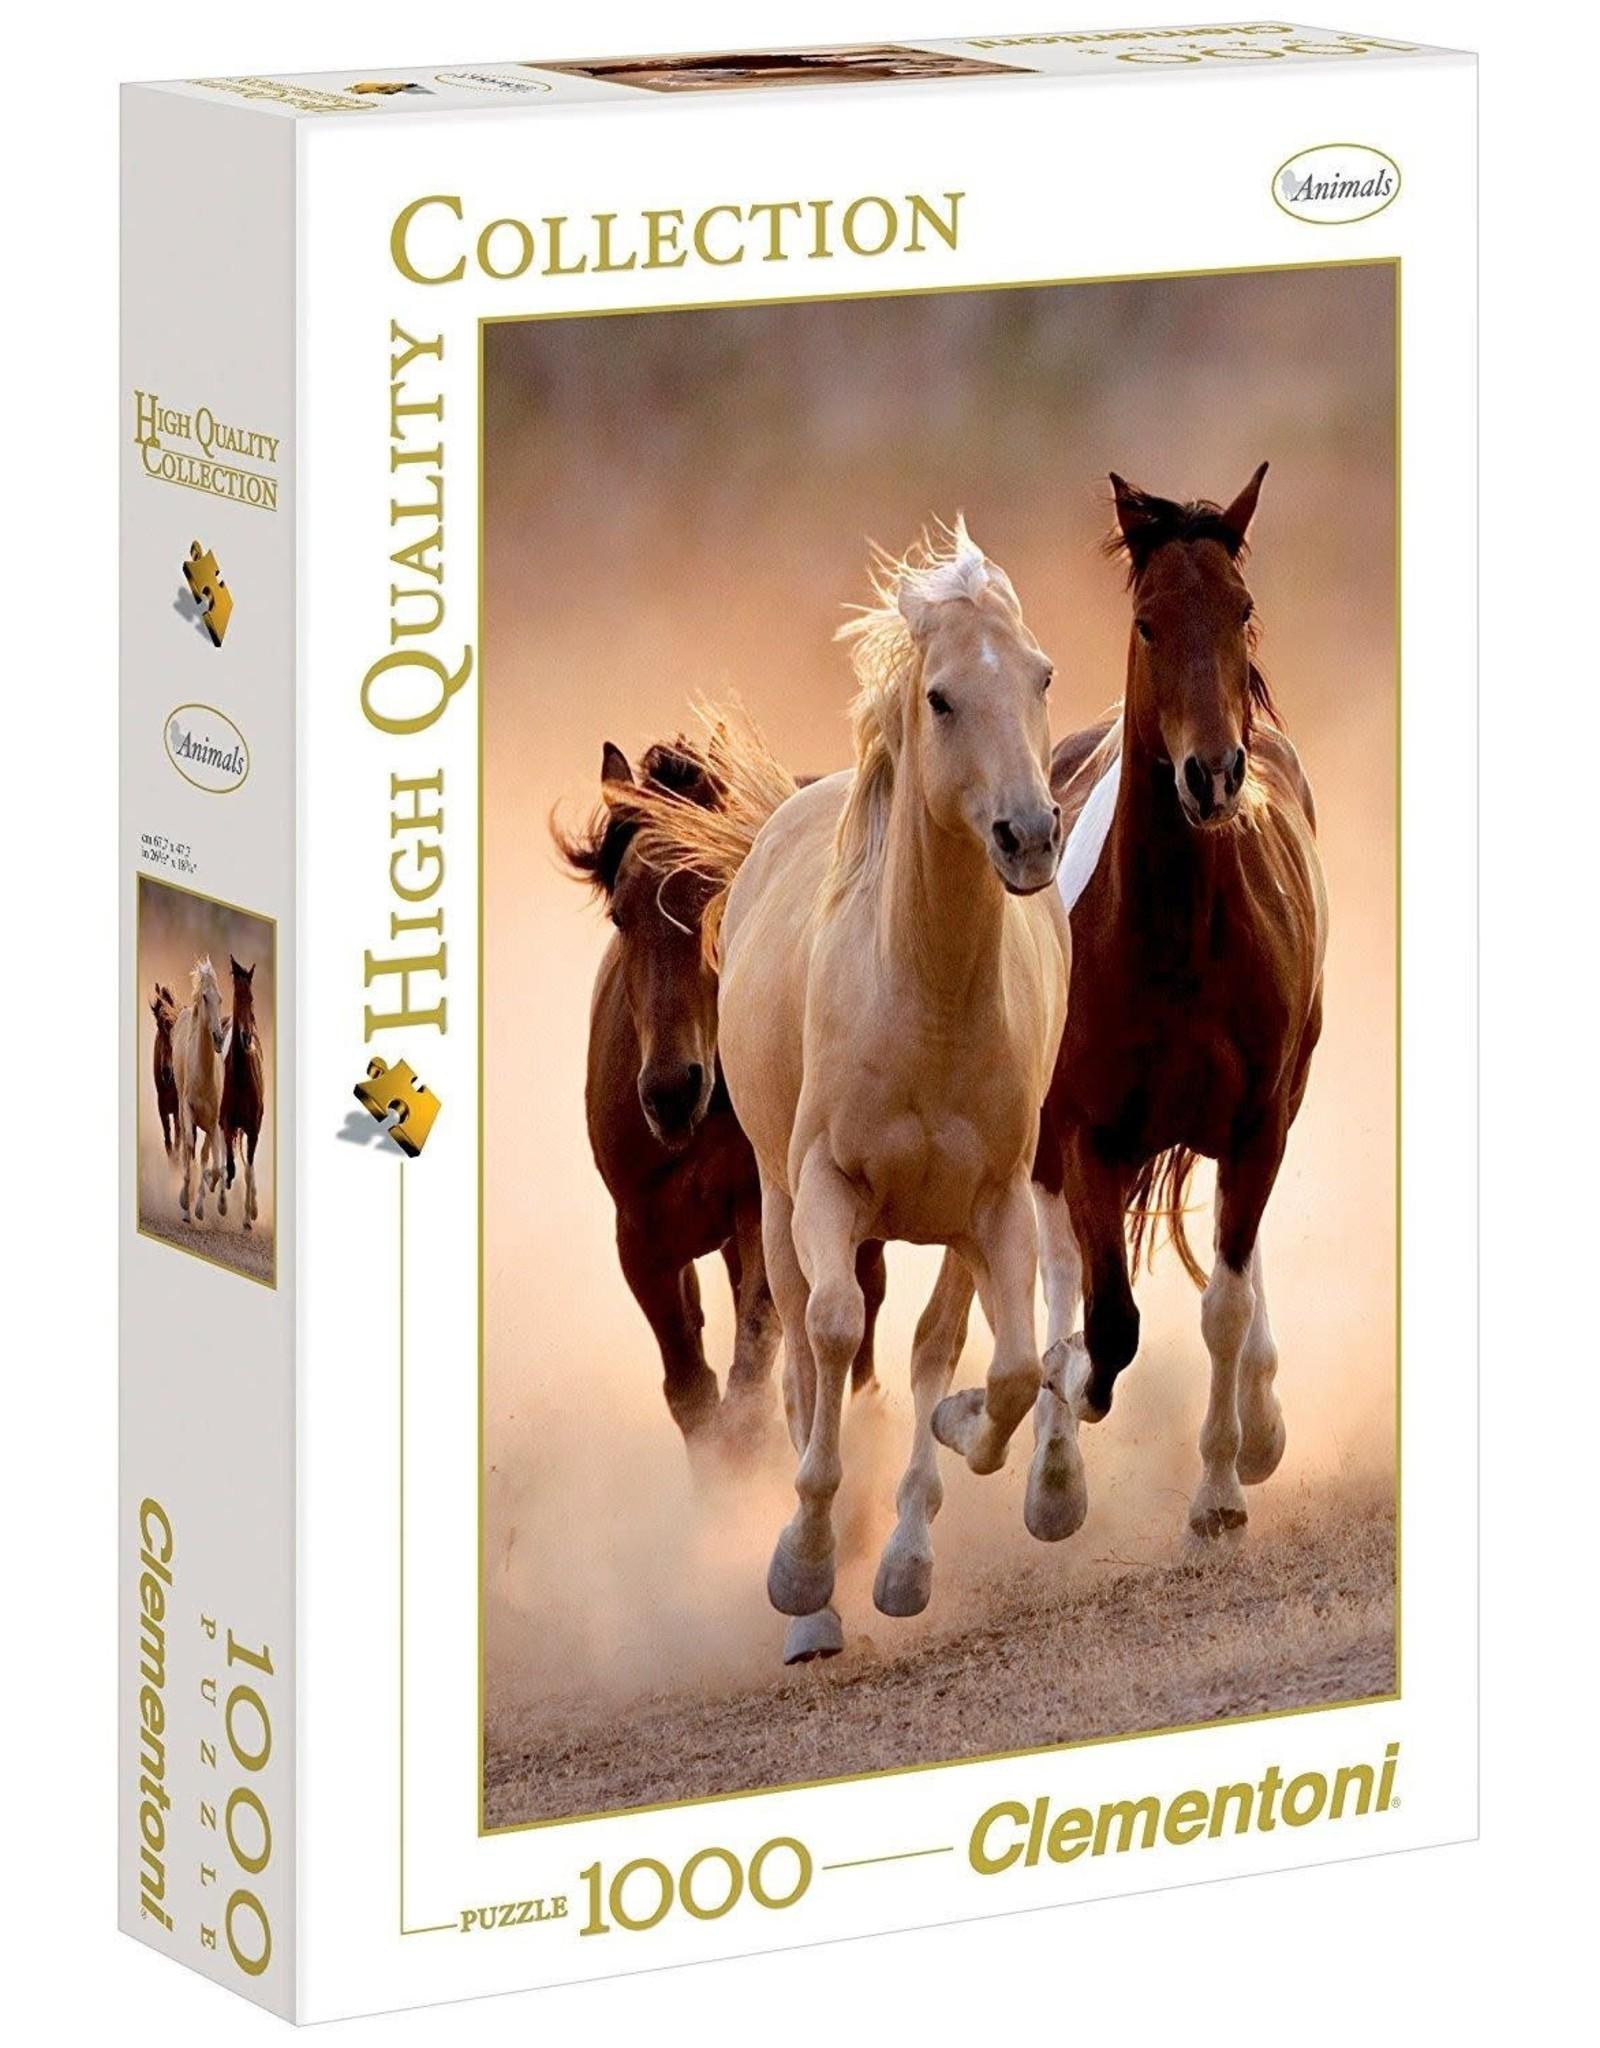 Clementoni 1000PC HQC - RUNNING HORSES